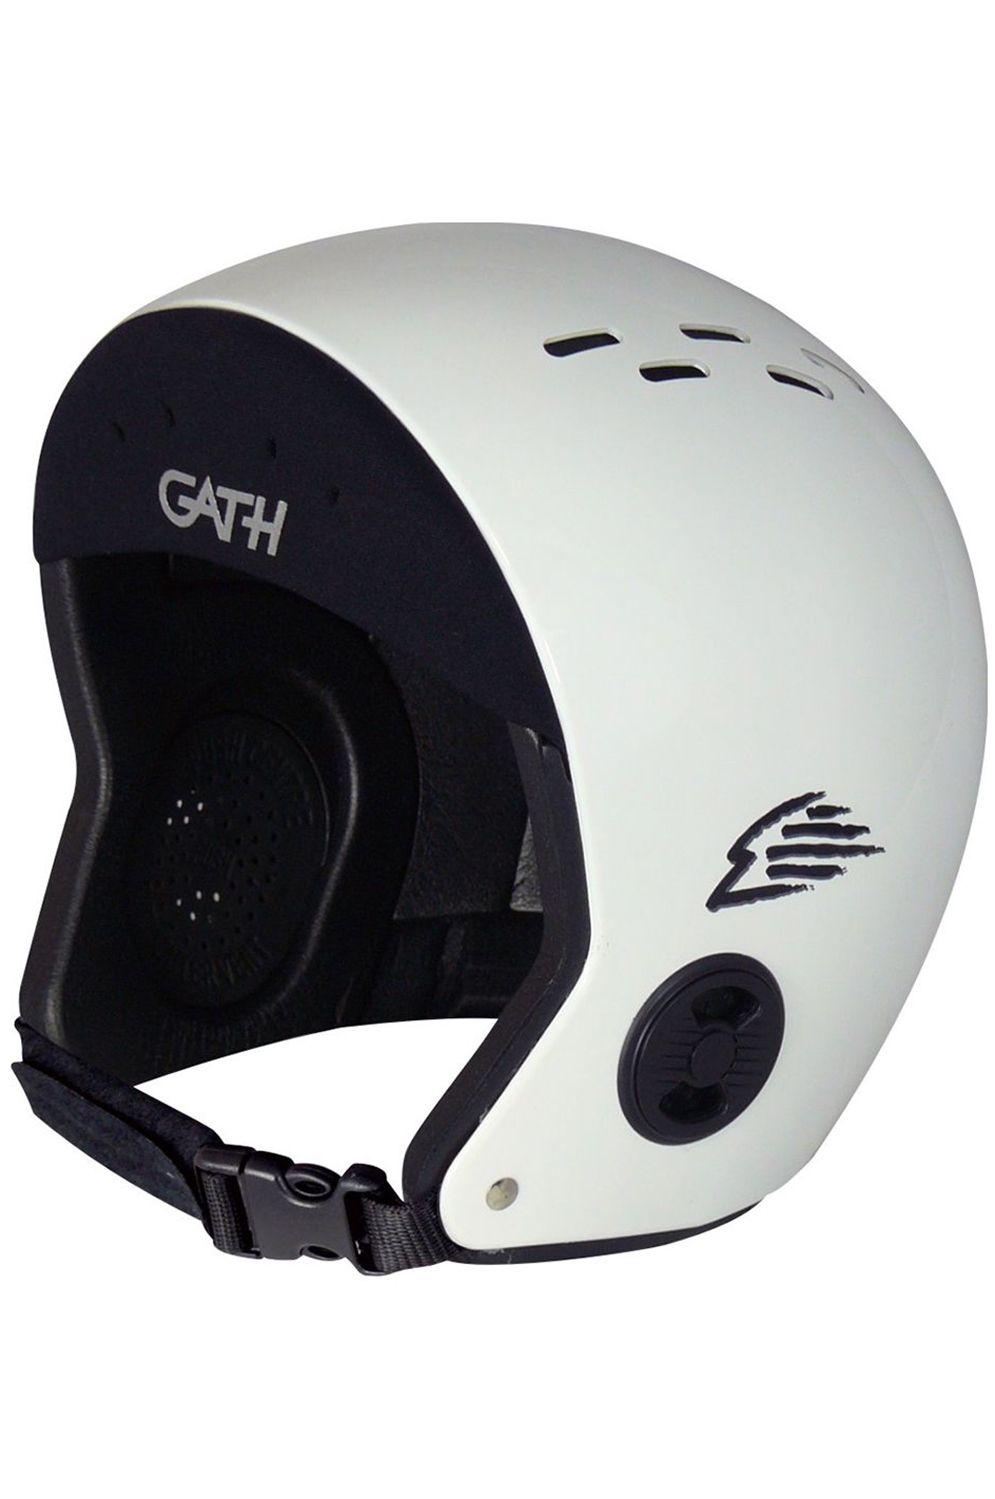 Gath Helmet GATH HAT White Gloss